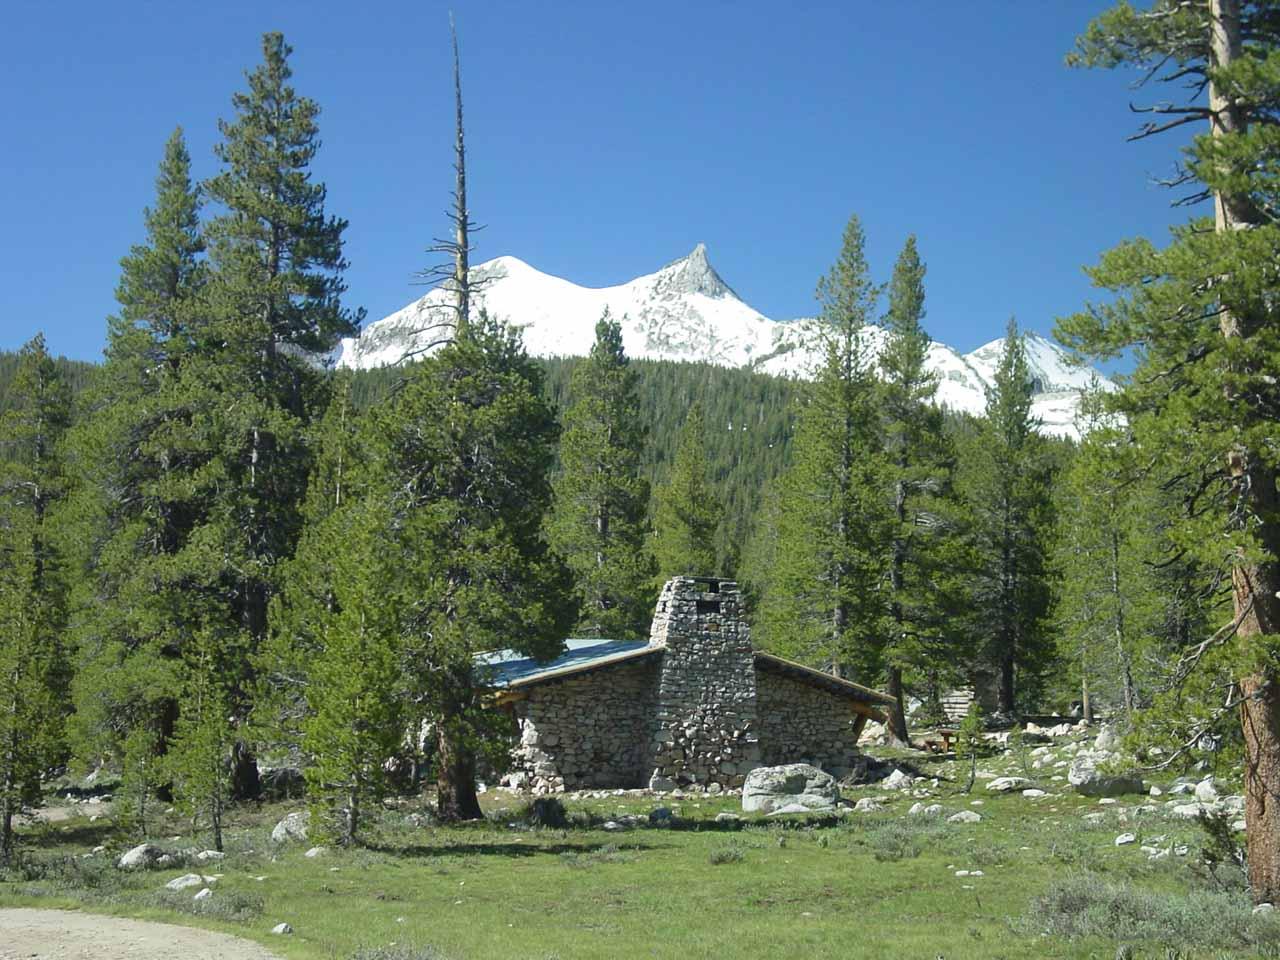 Parson's Lodge and Unicorn Peak